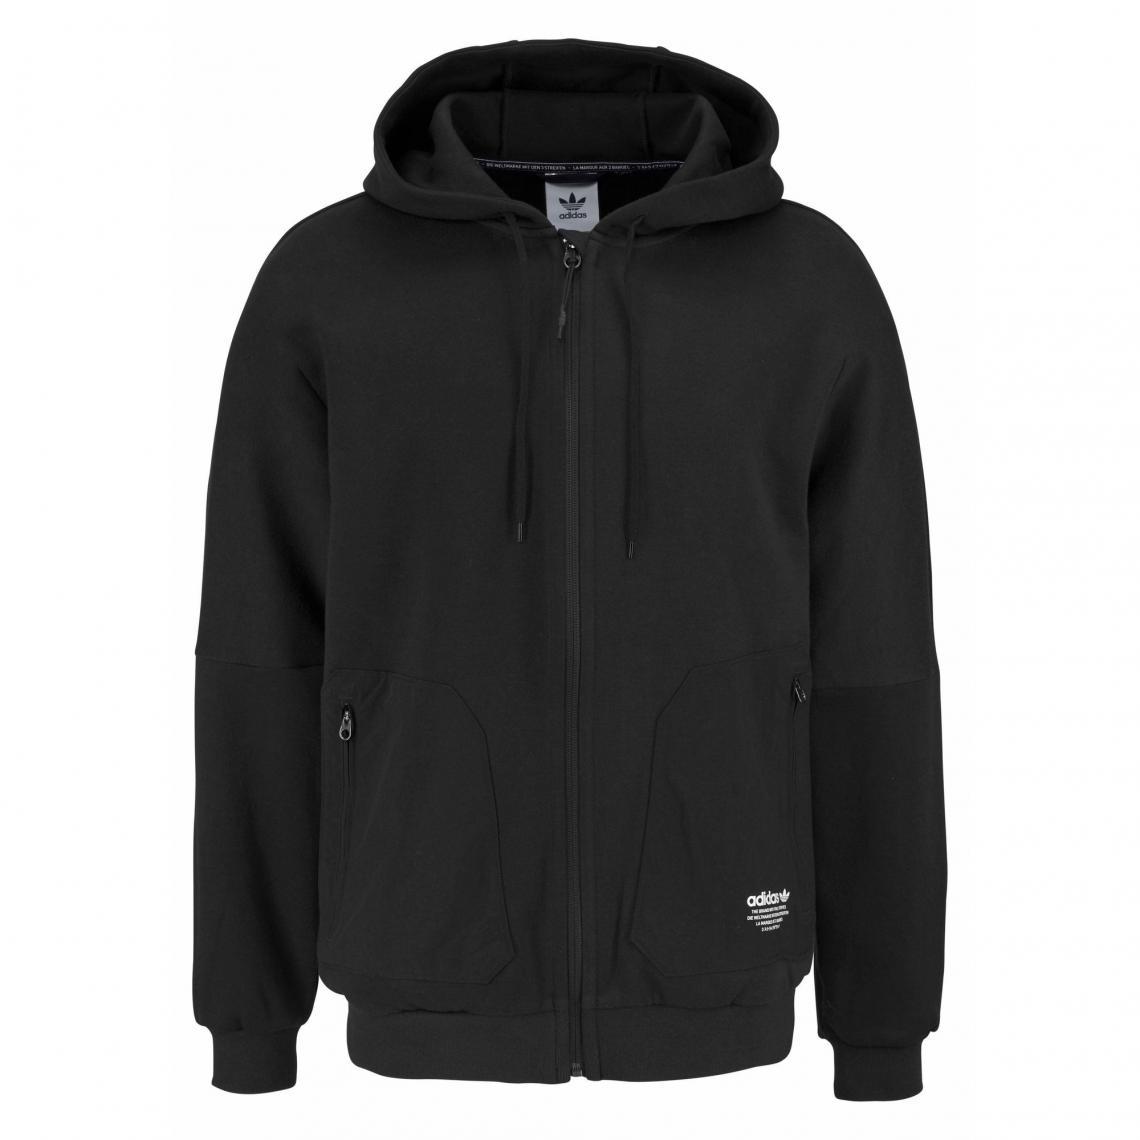 Capuche Adidas Originals Zippé Nmd À Manches Longues Sweat Homme nad8I0wx